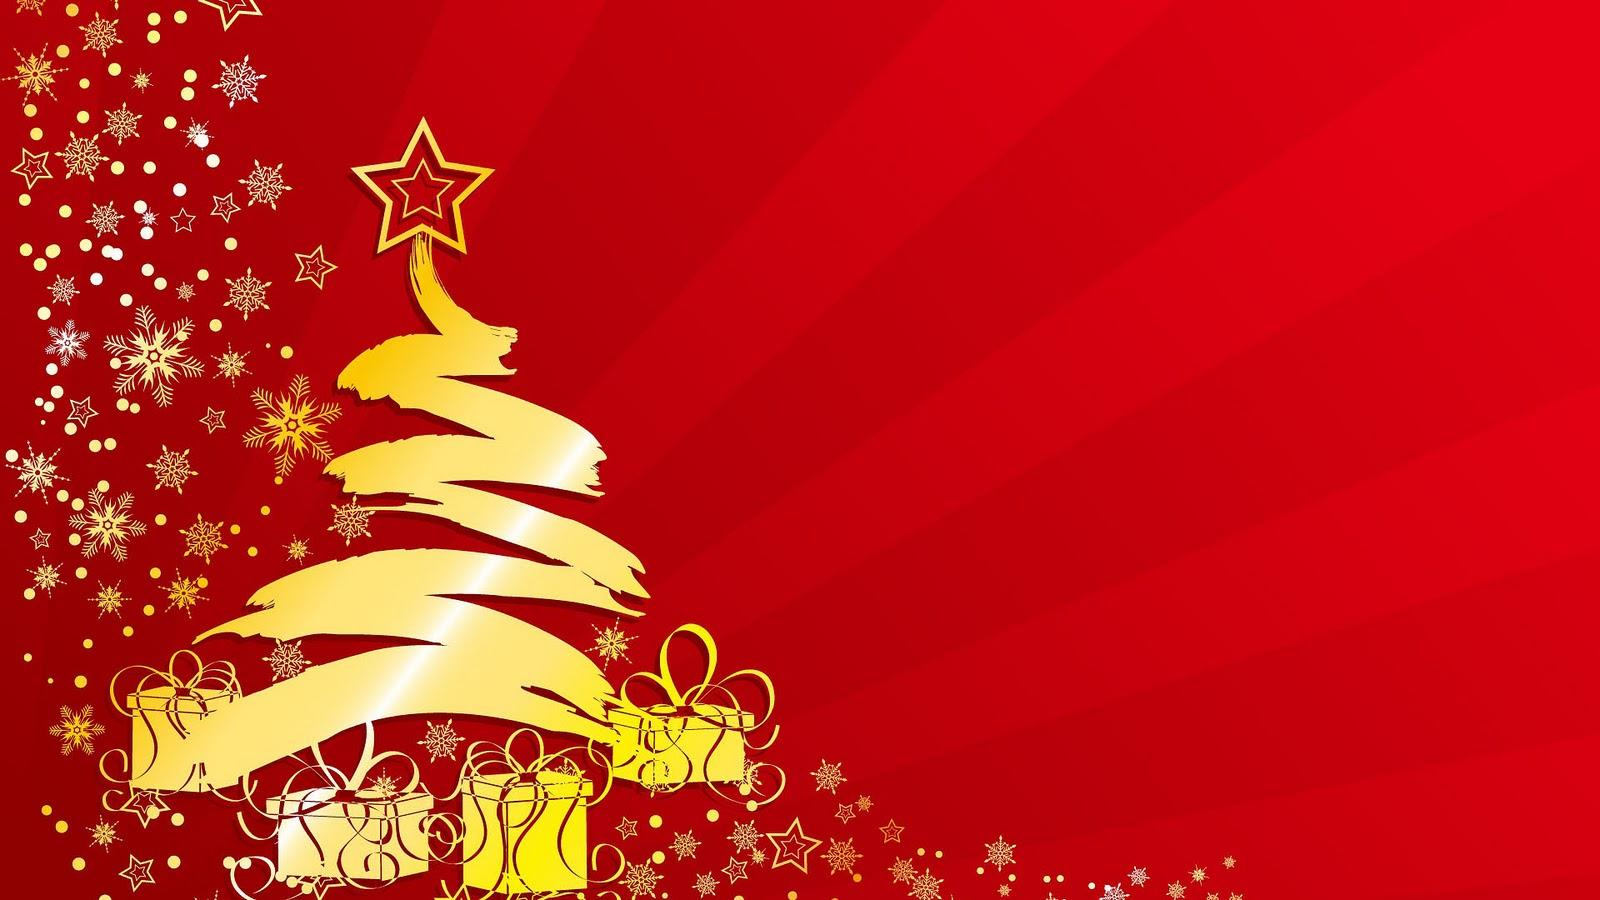 christmas background images free